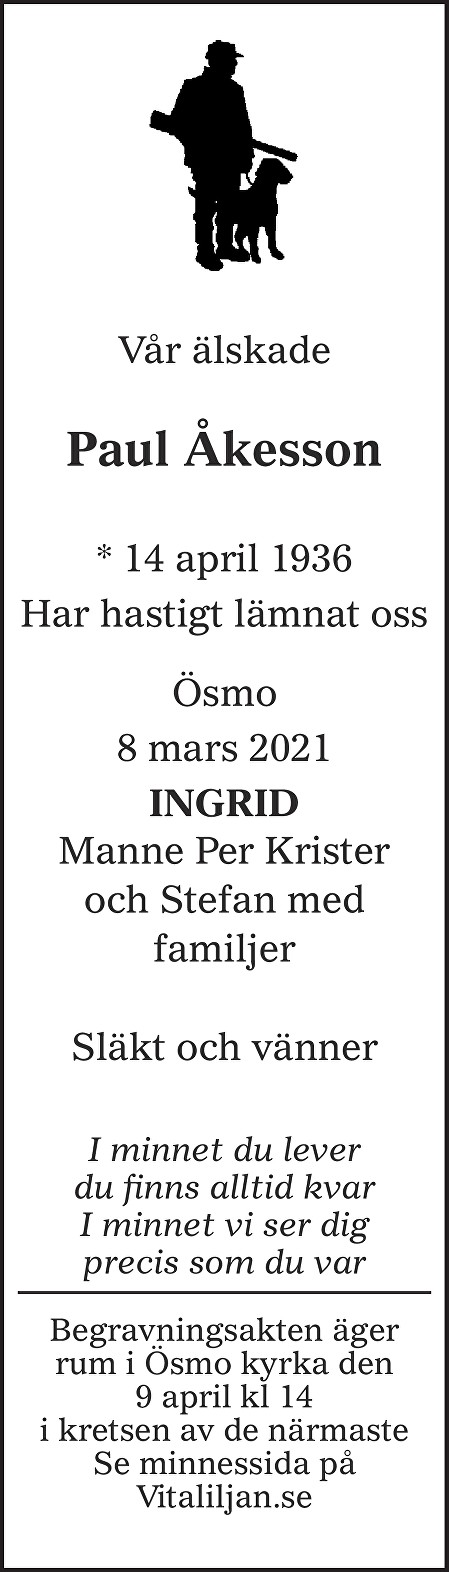 Paul Åkesson Death notice